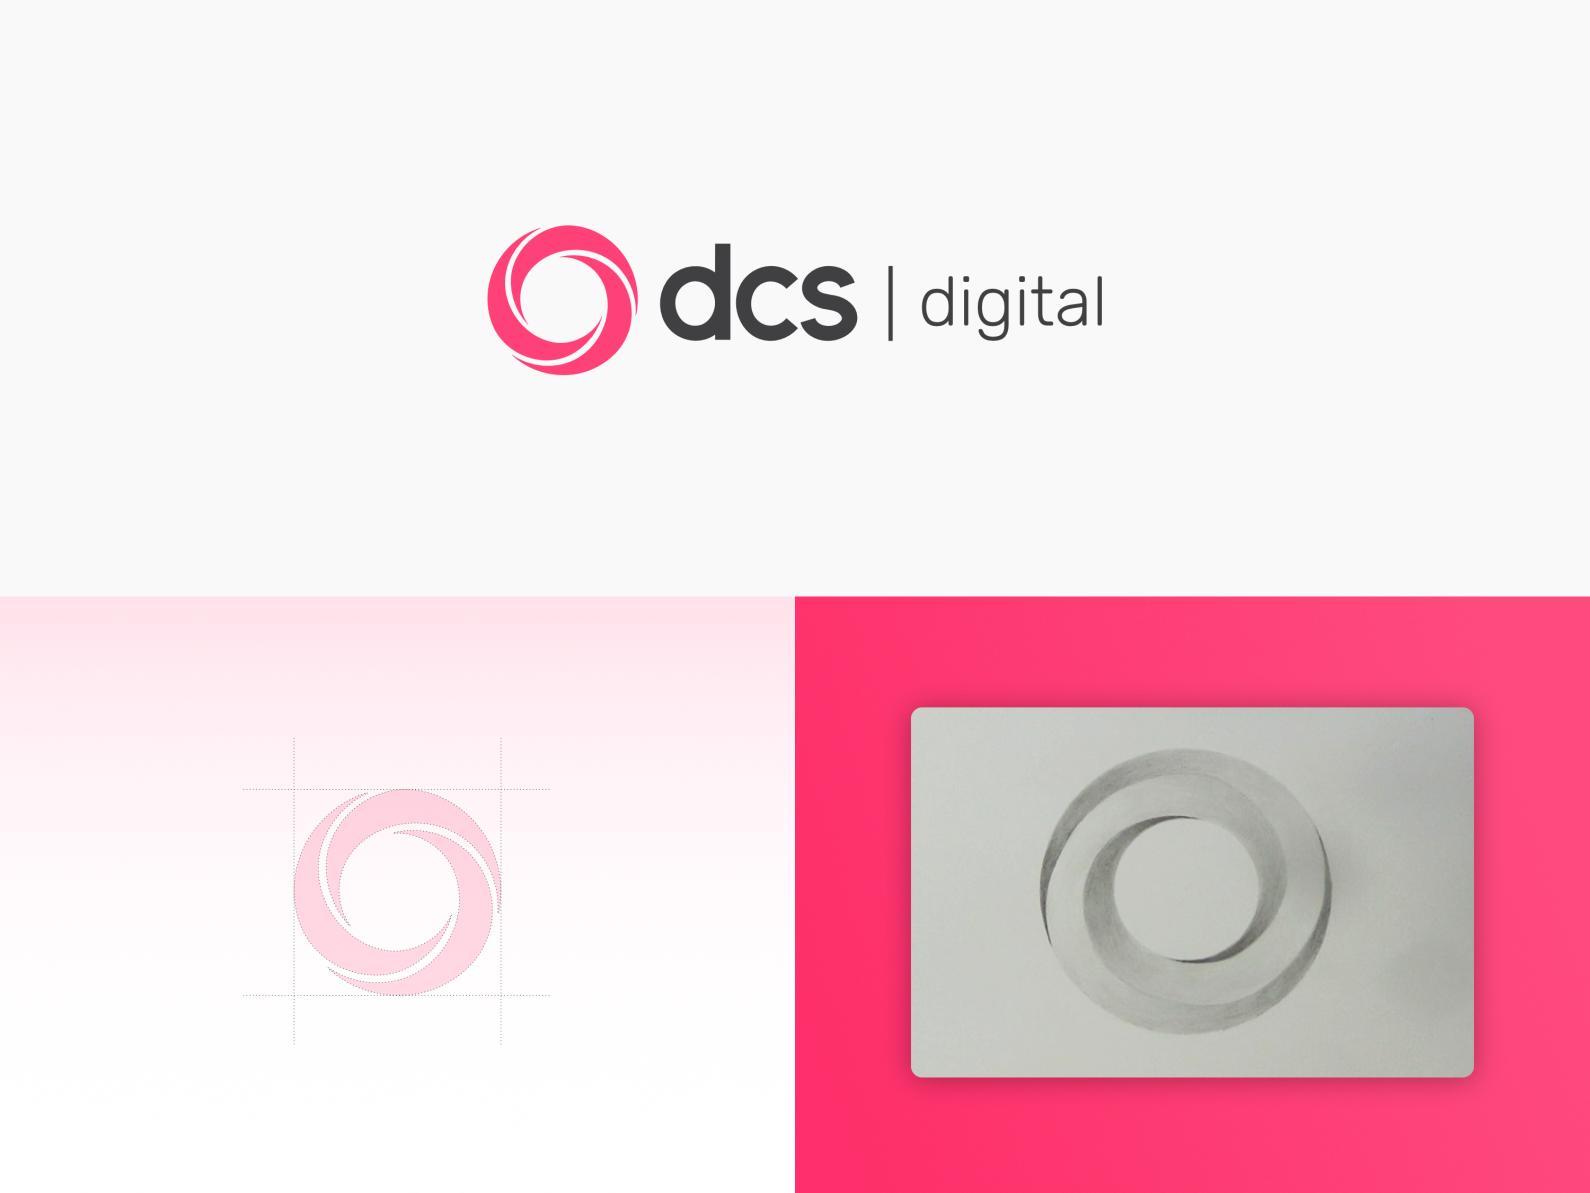 Dcs digital logo design